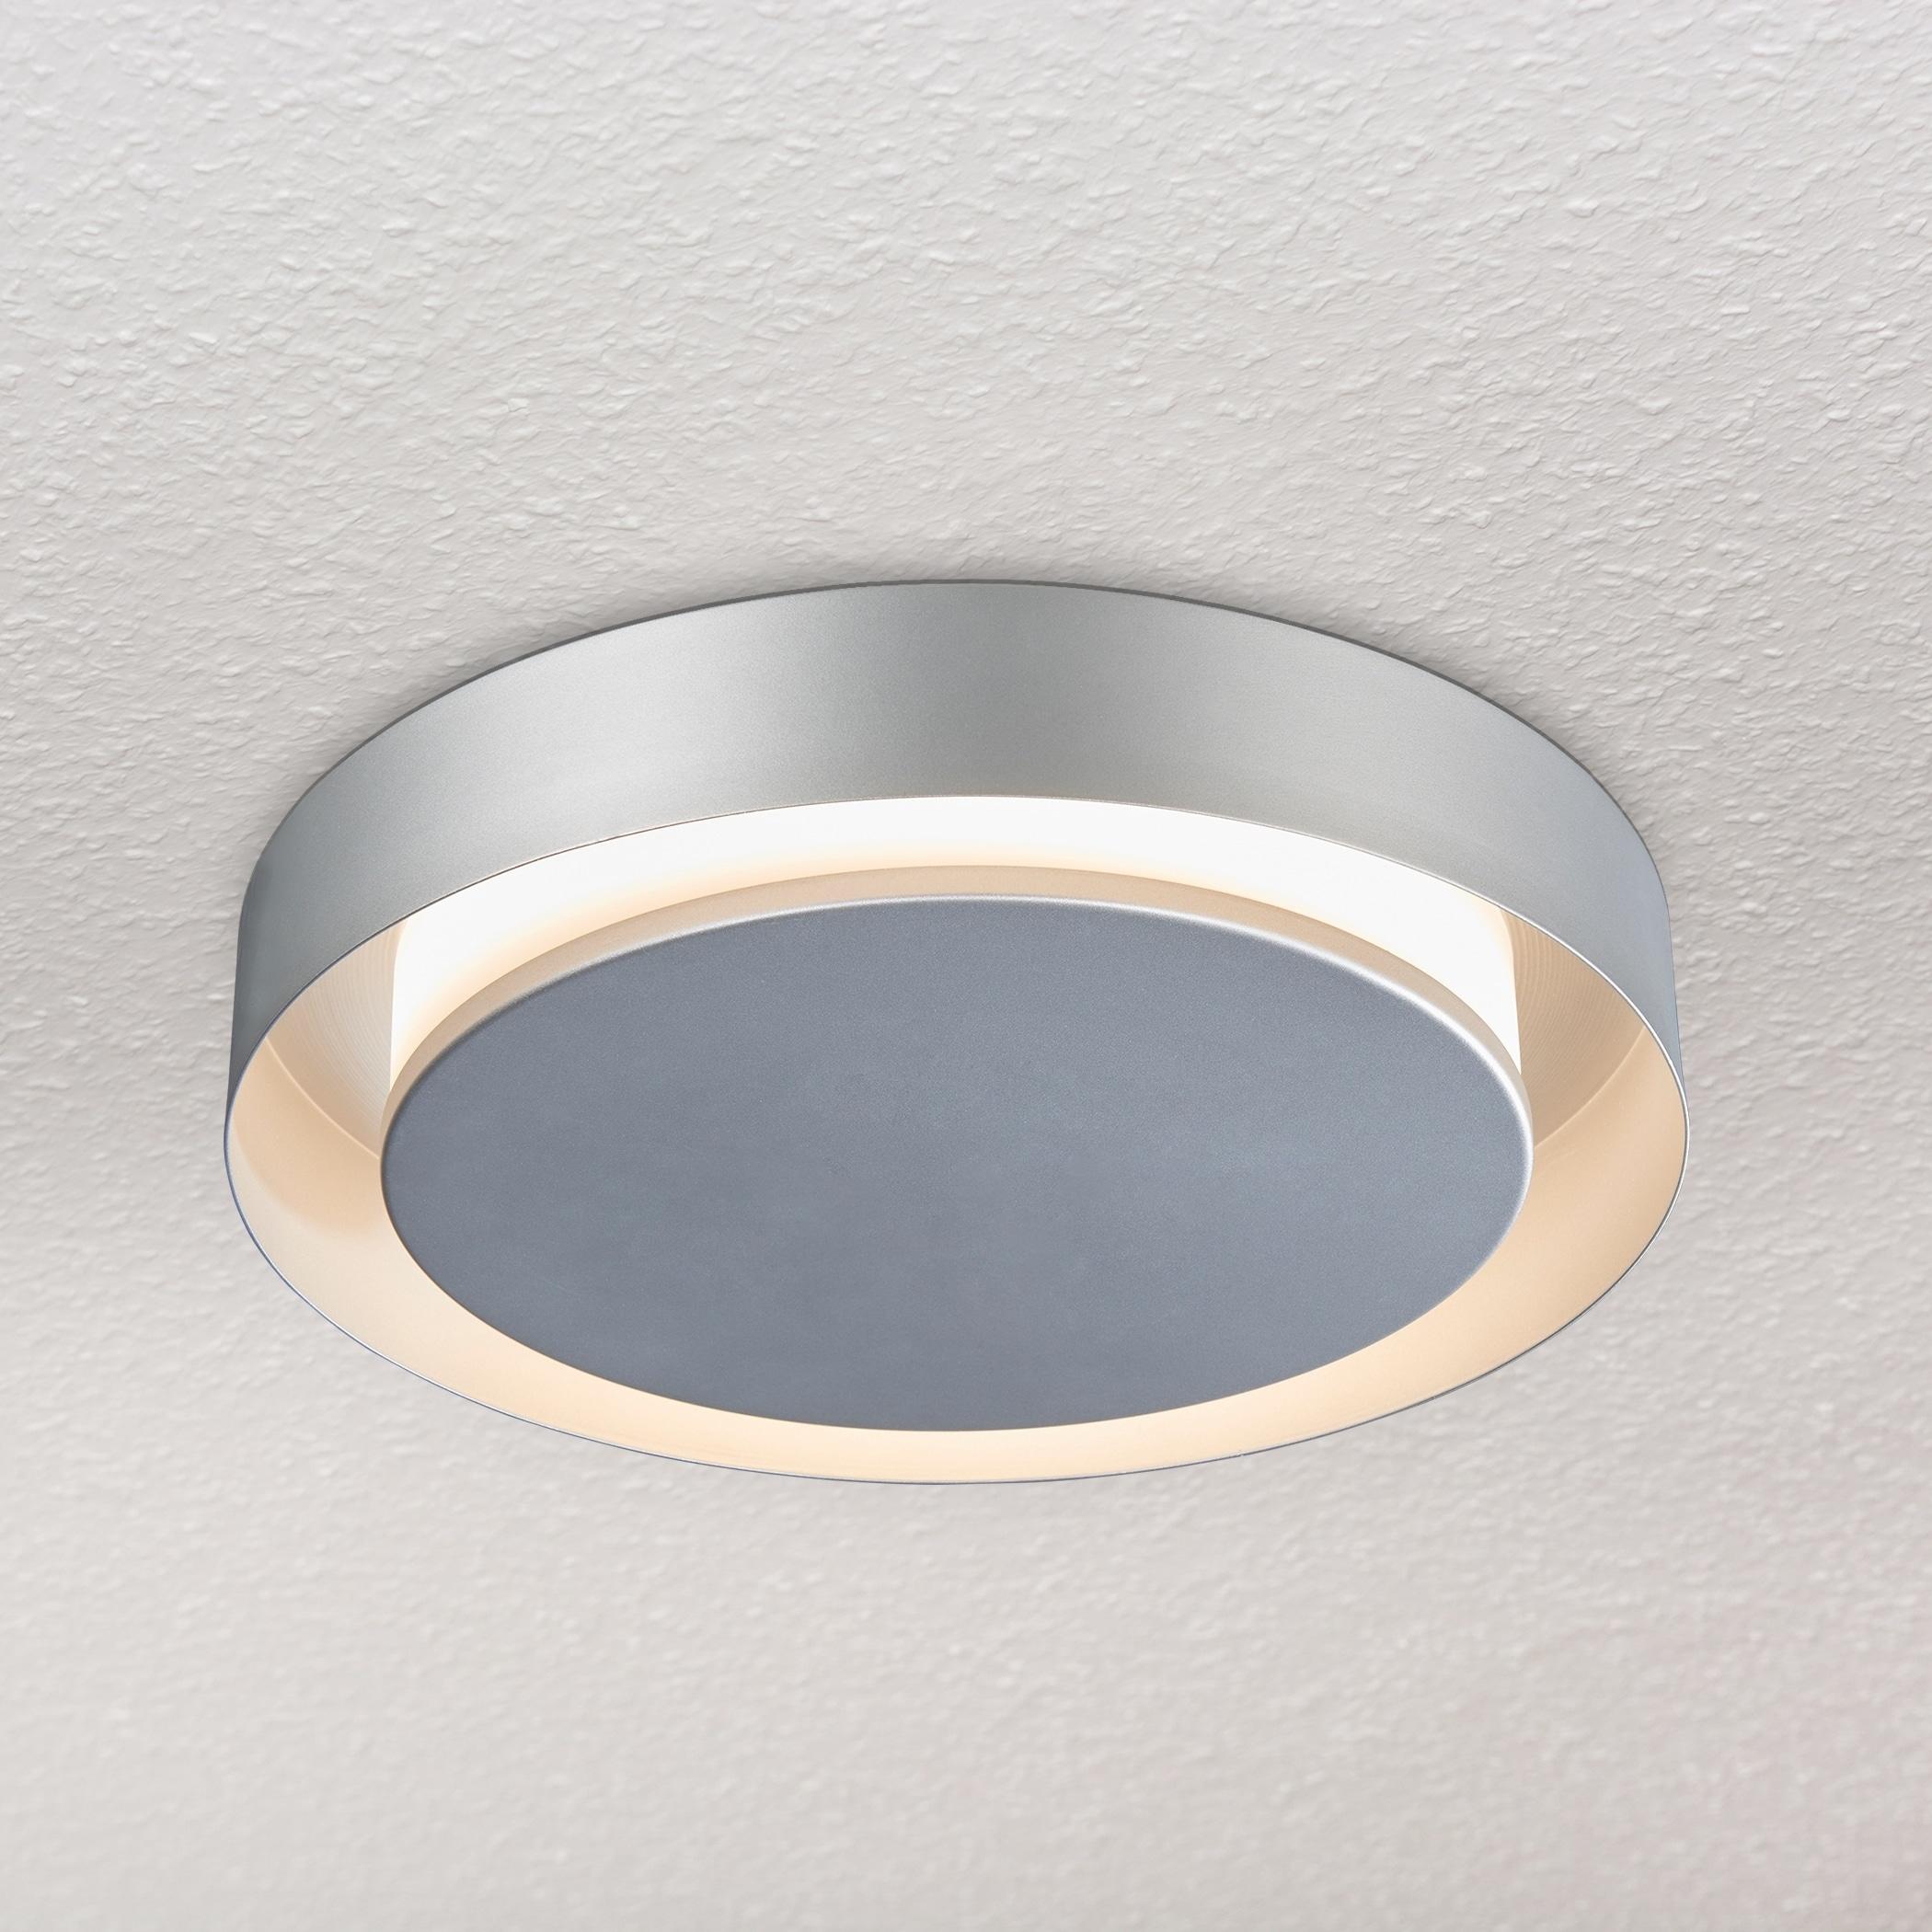 Vonn lighting vmcf41100al talitha 16 inch led circular ceiling fixture in silver